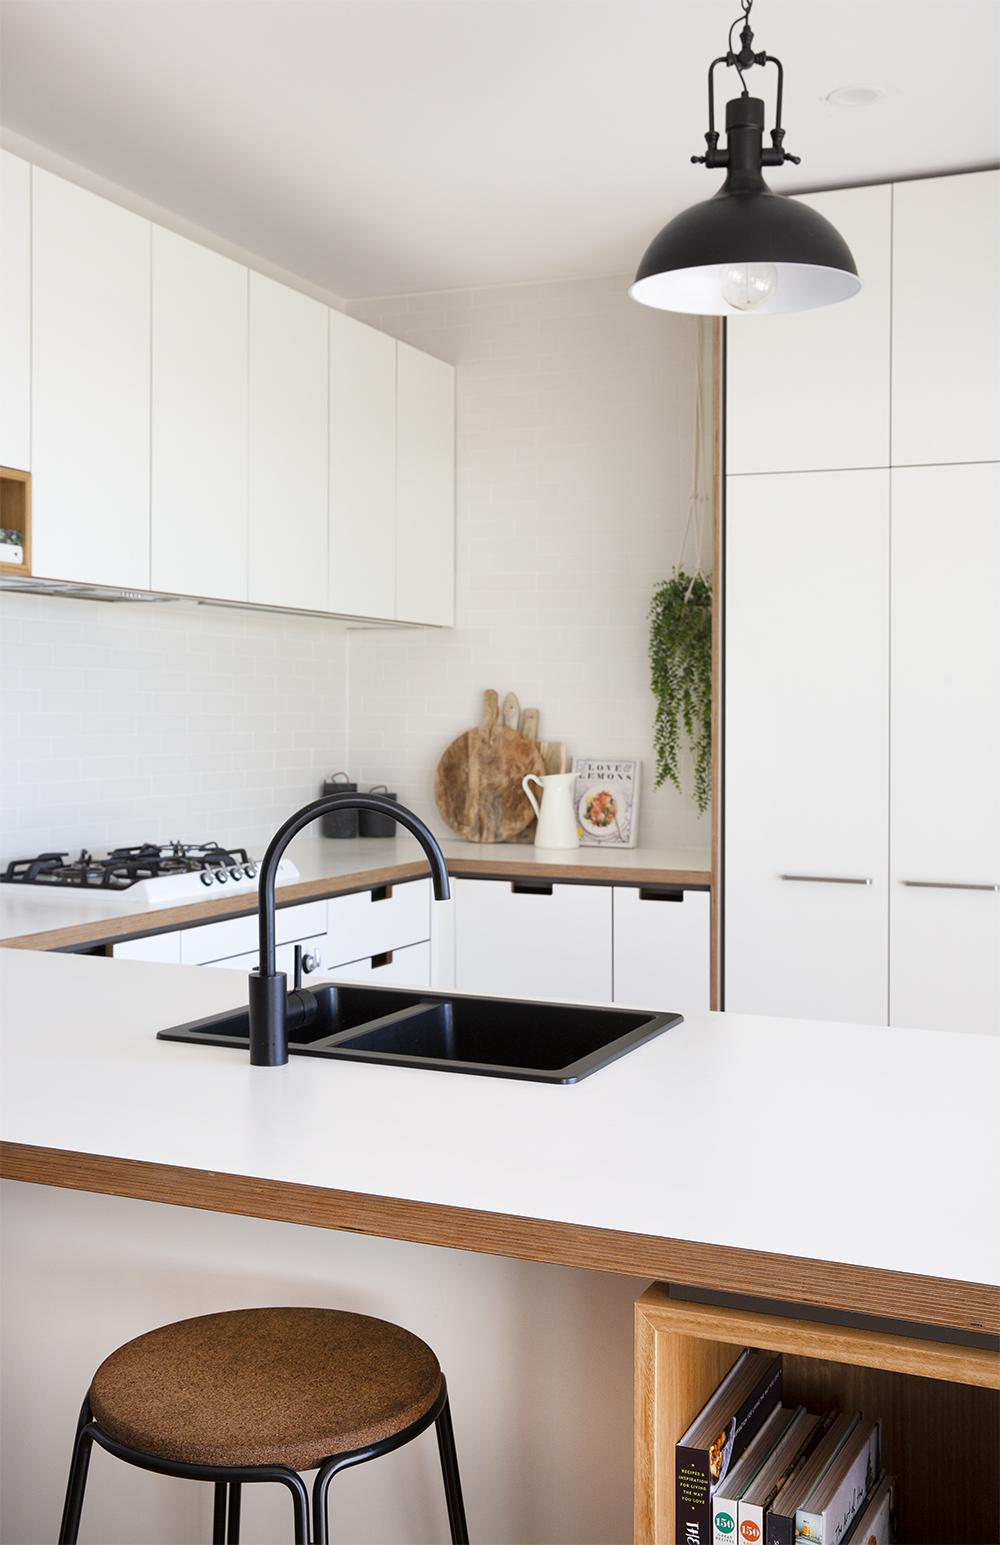 Cantilever K3 Kitchen specified by Black Arrow Co (7).jpg